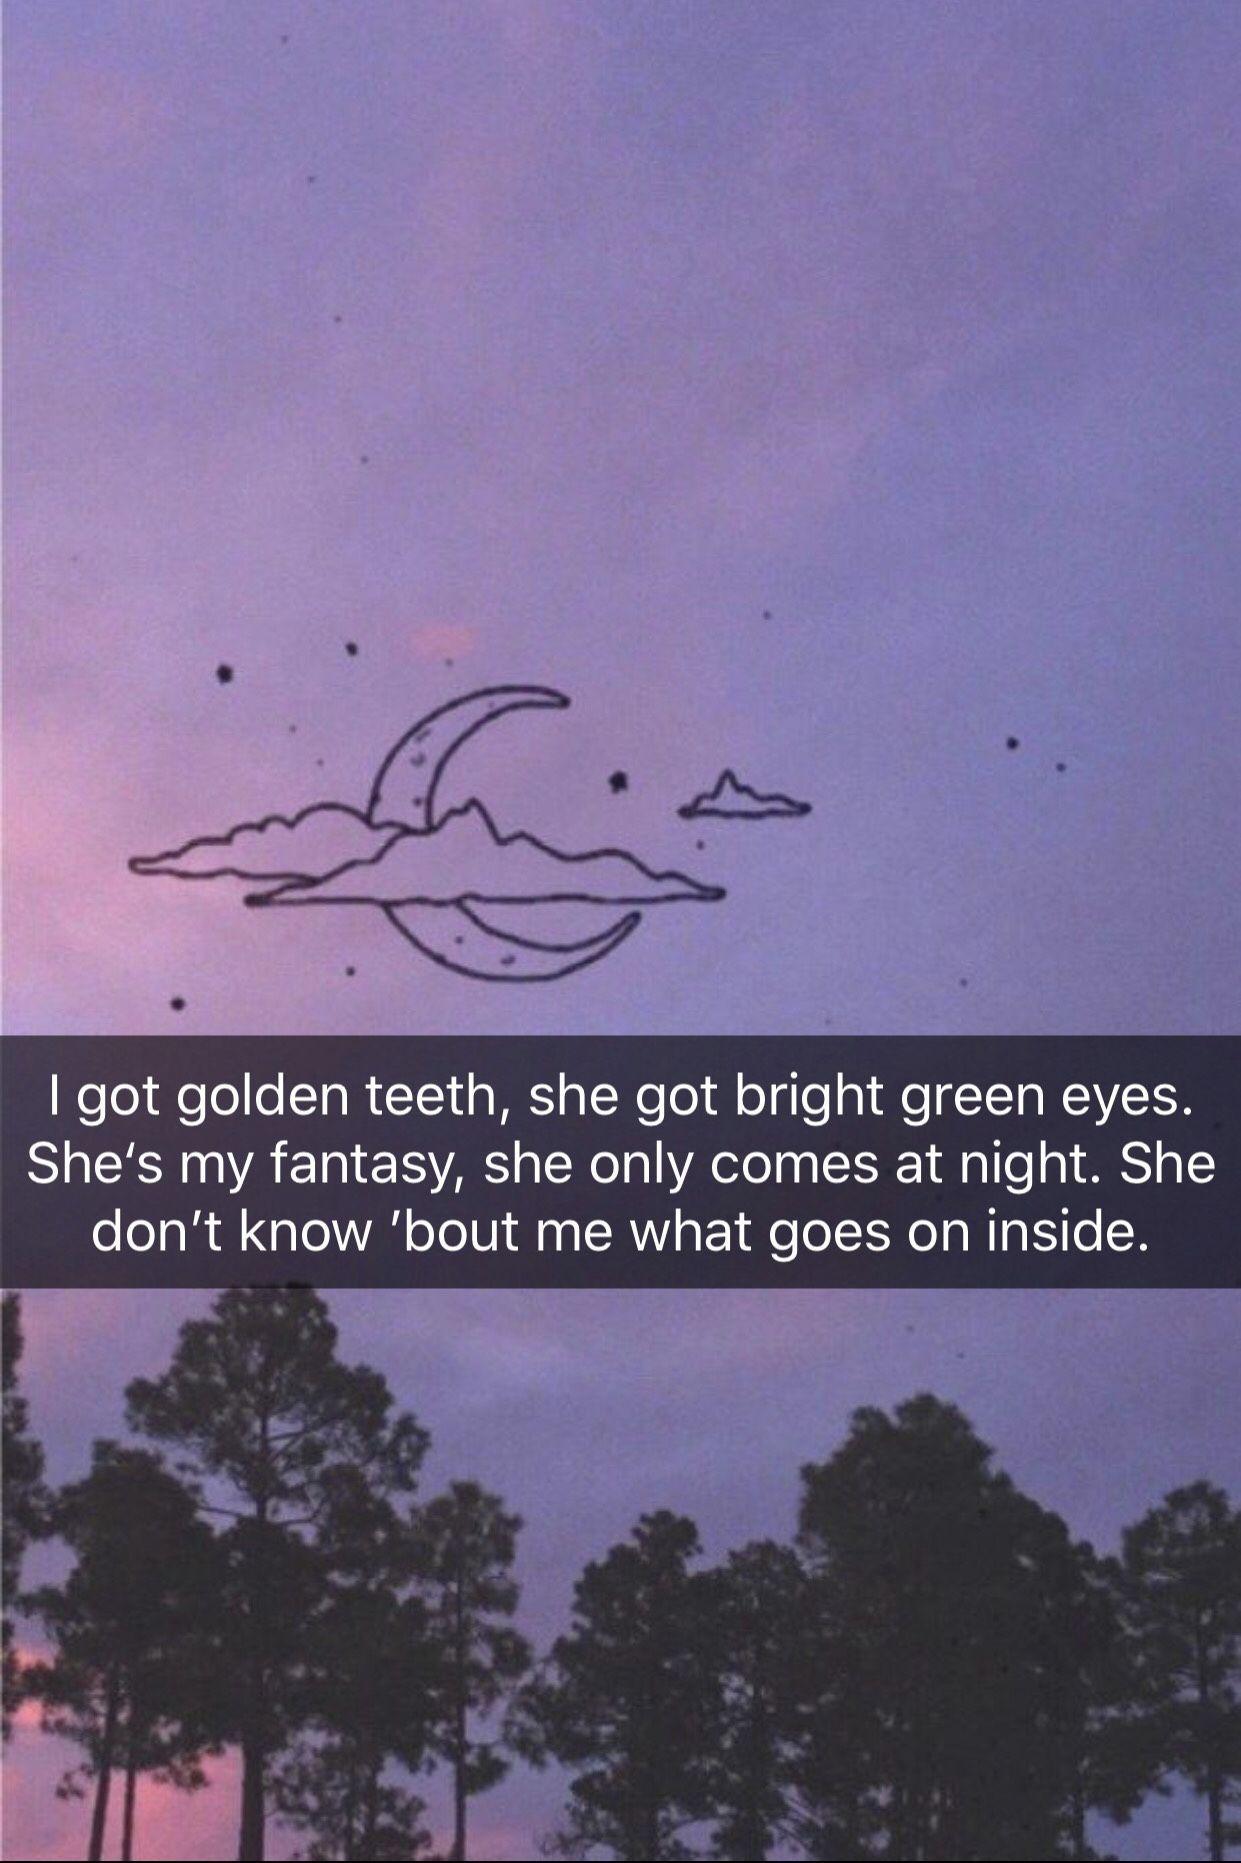 List 25 Best Lil Peep Quotes Photos Collection Lil Peep Lyrics Rapper Quotes Mood Quotes